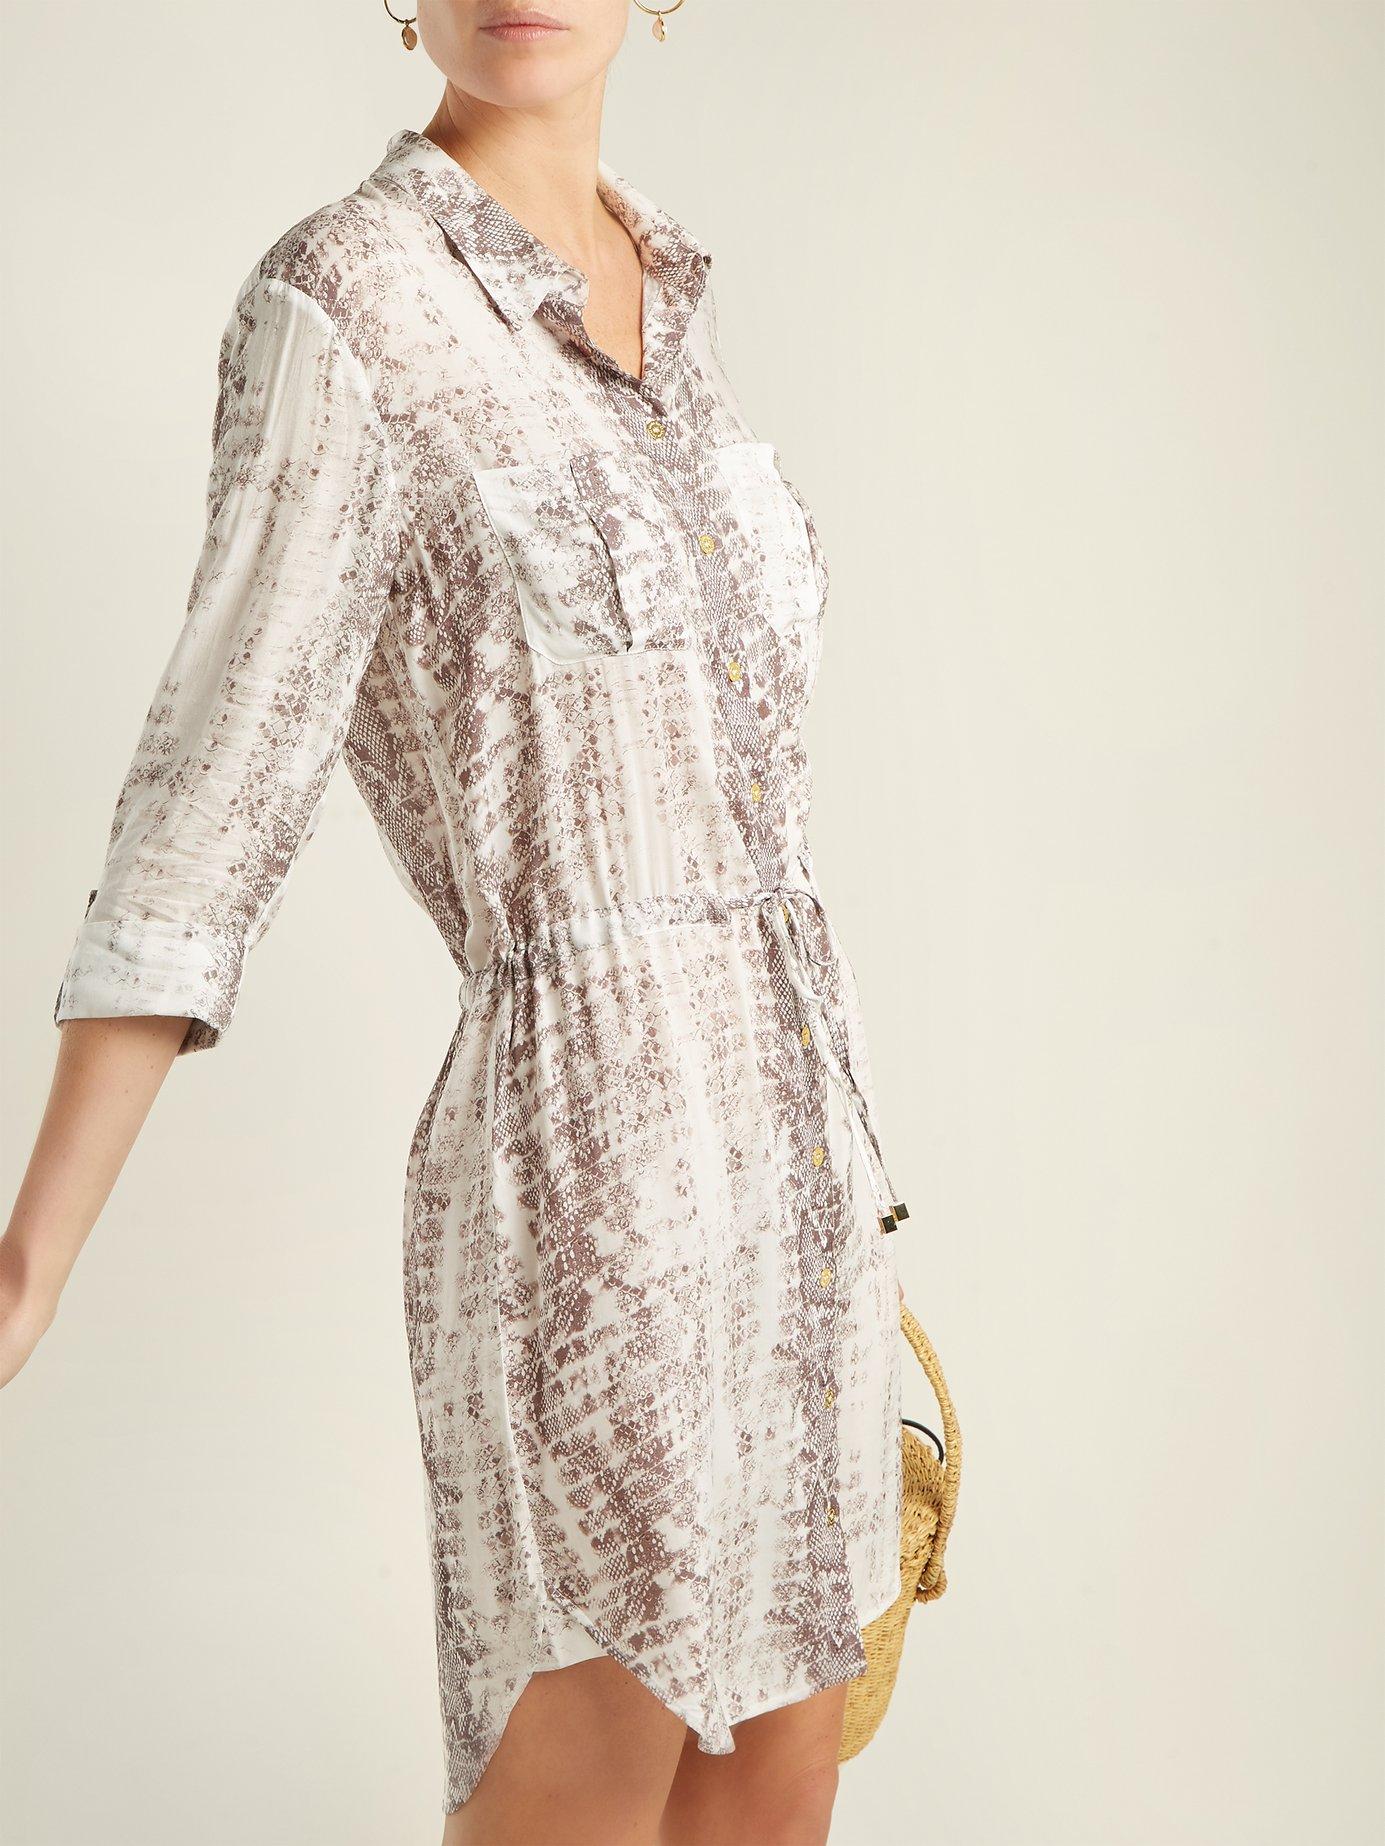 Saint Barths printed poplin shirt dress by Heidi Klein